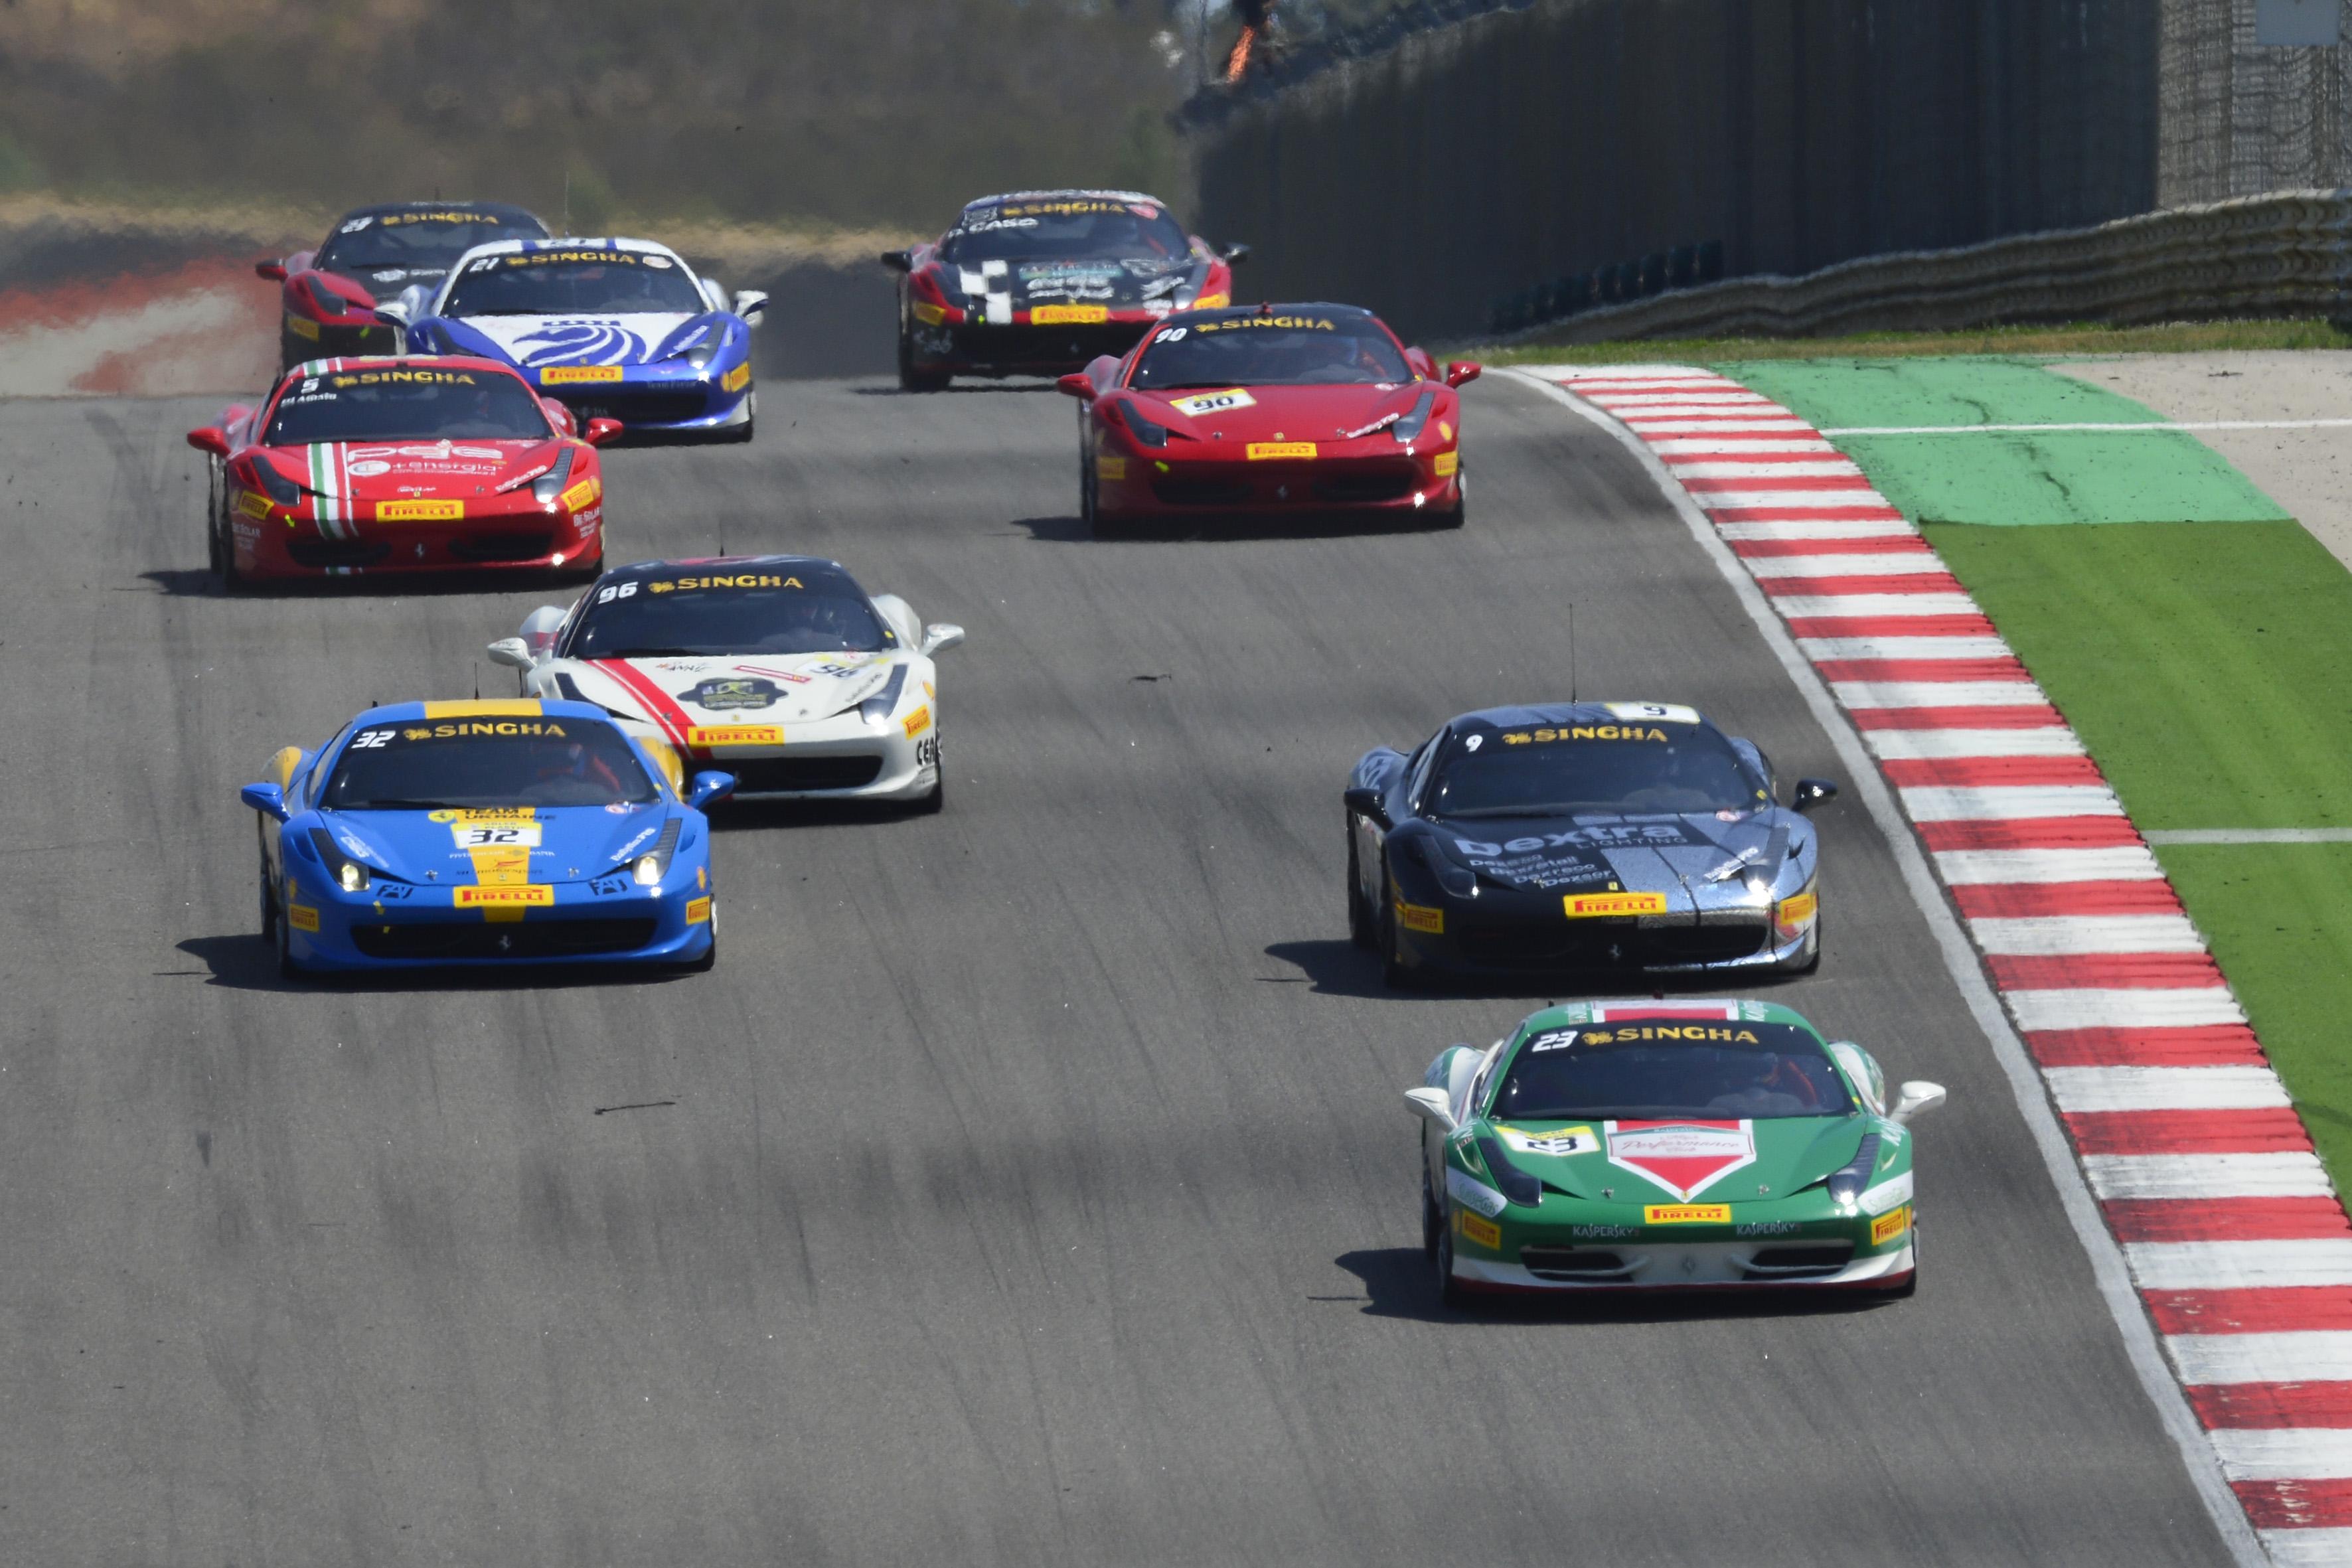 Ferrari Challenge 2013 India In F1